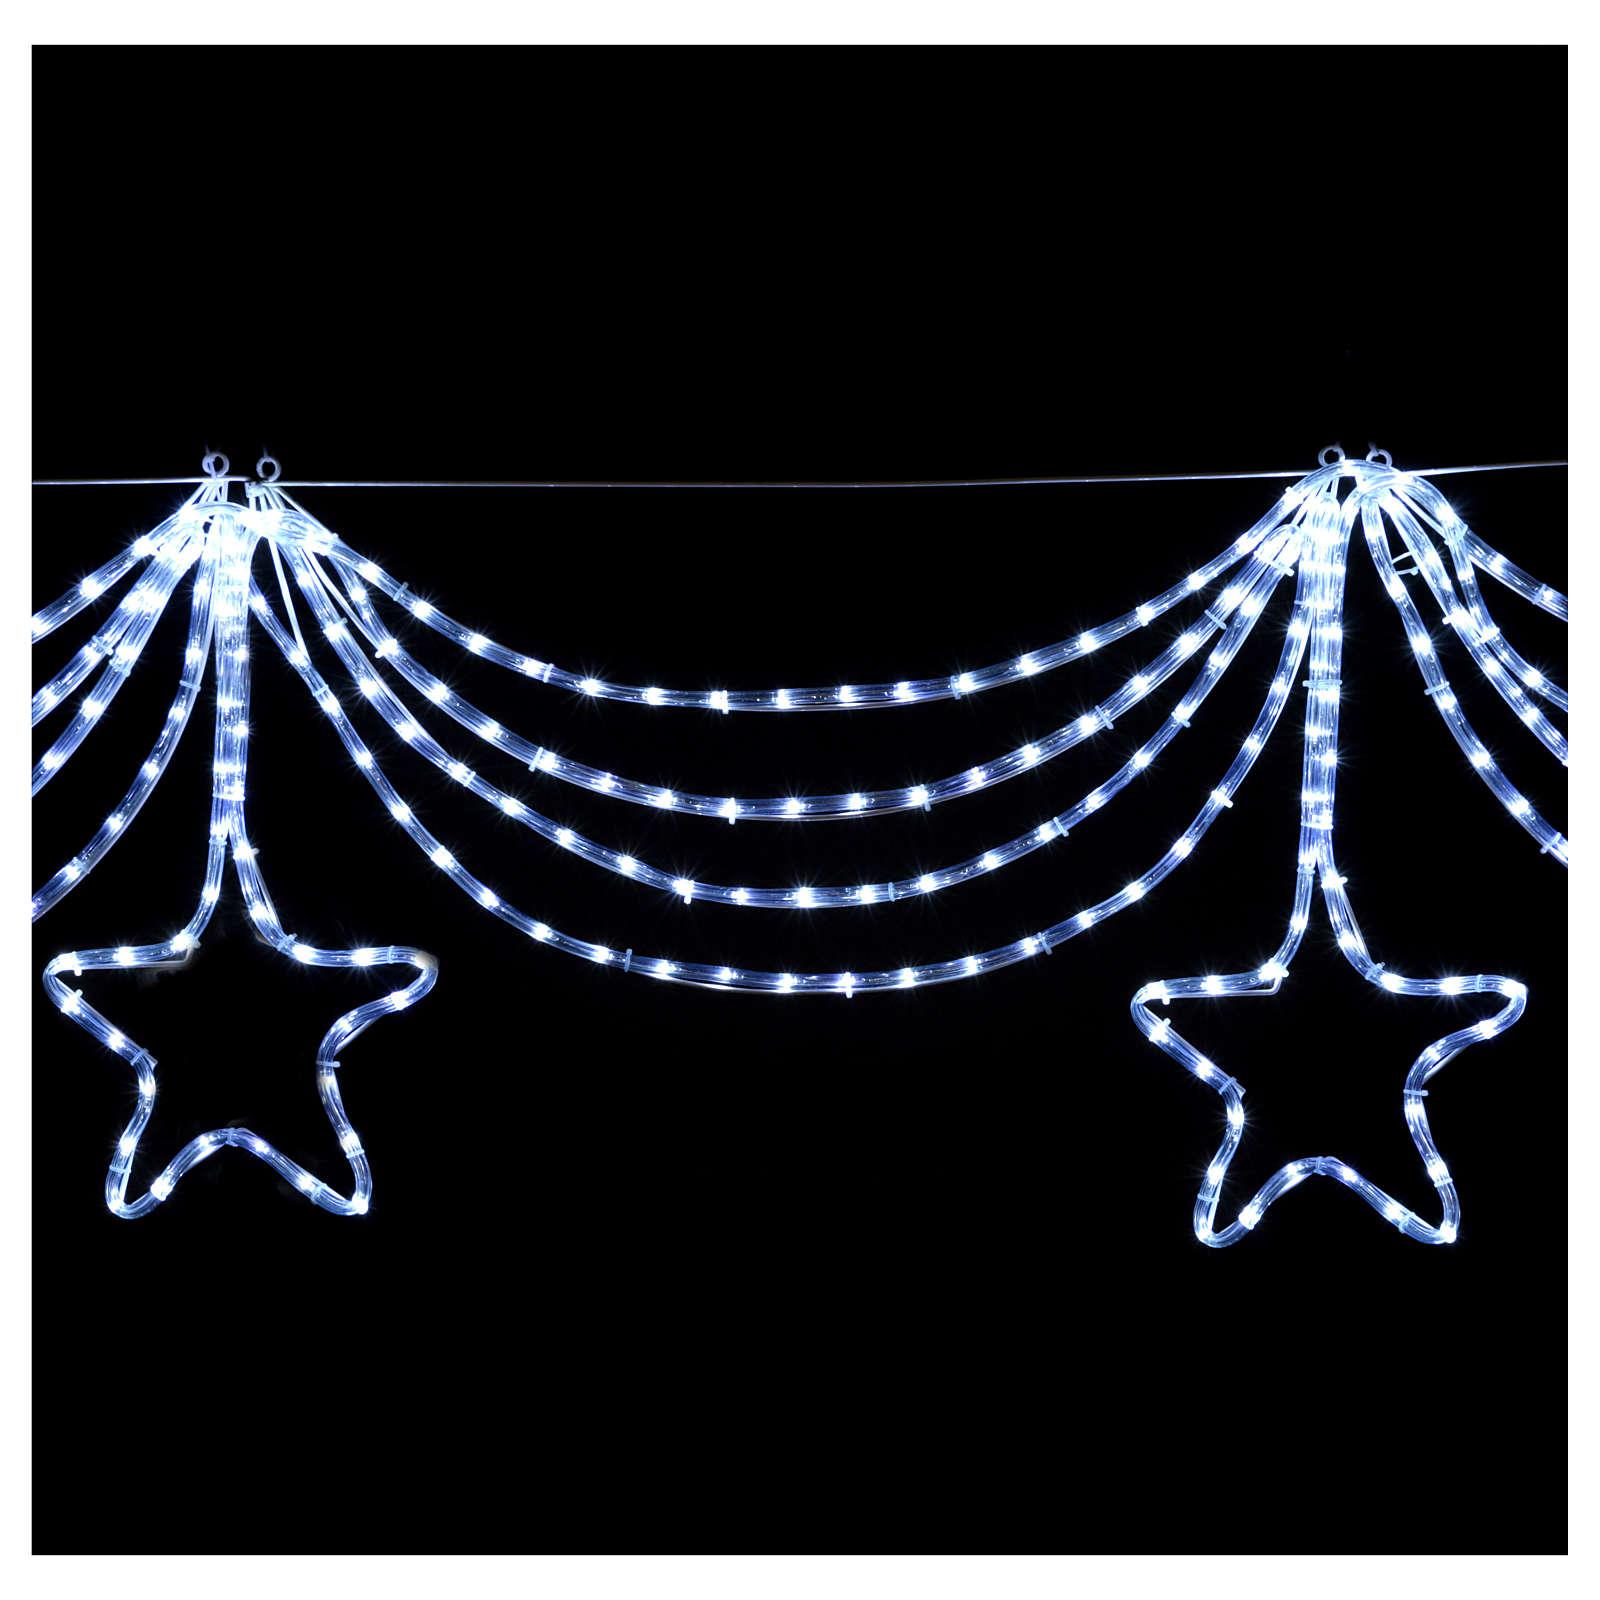 Luz festón estrellas 576 led hielo interior exterior 3